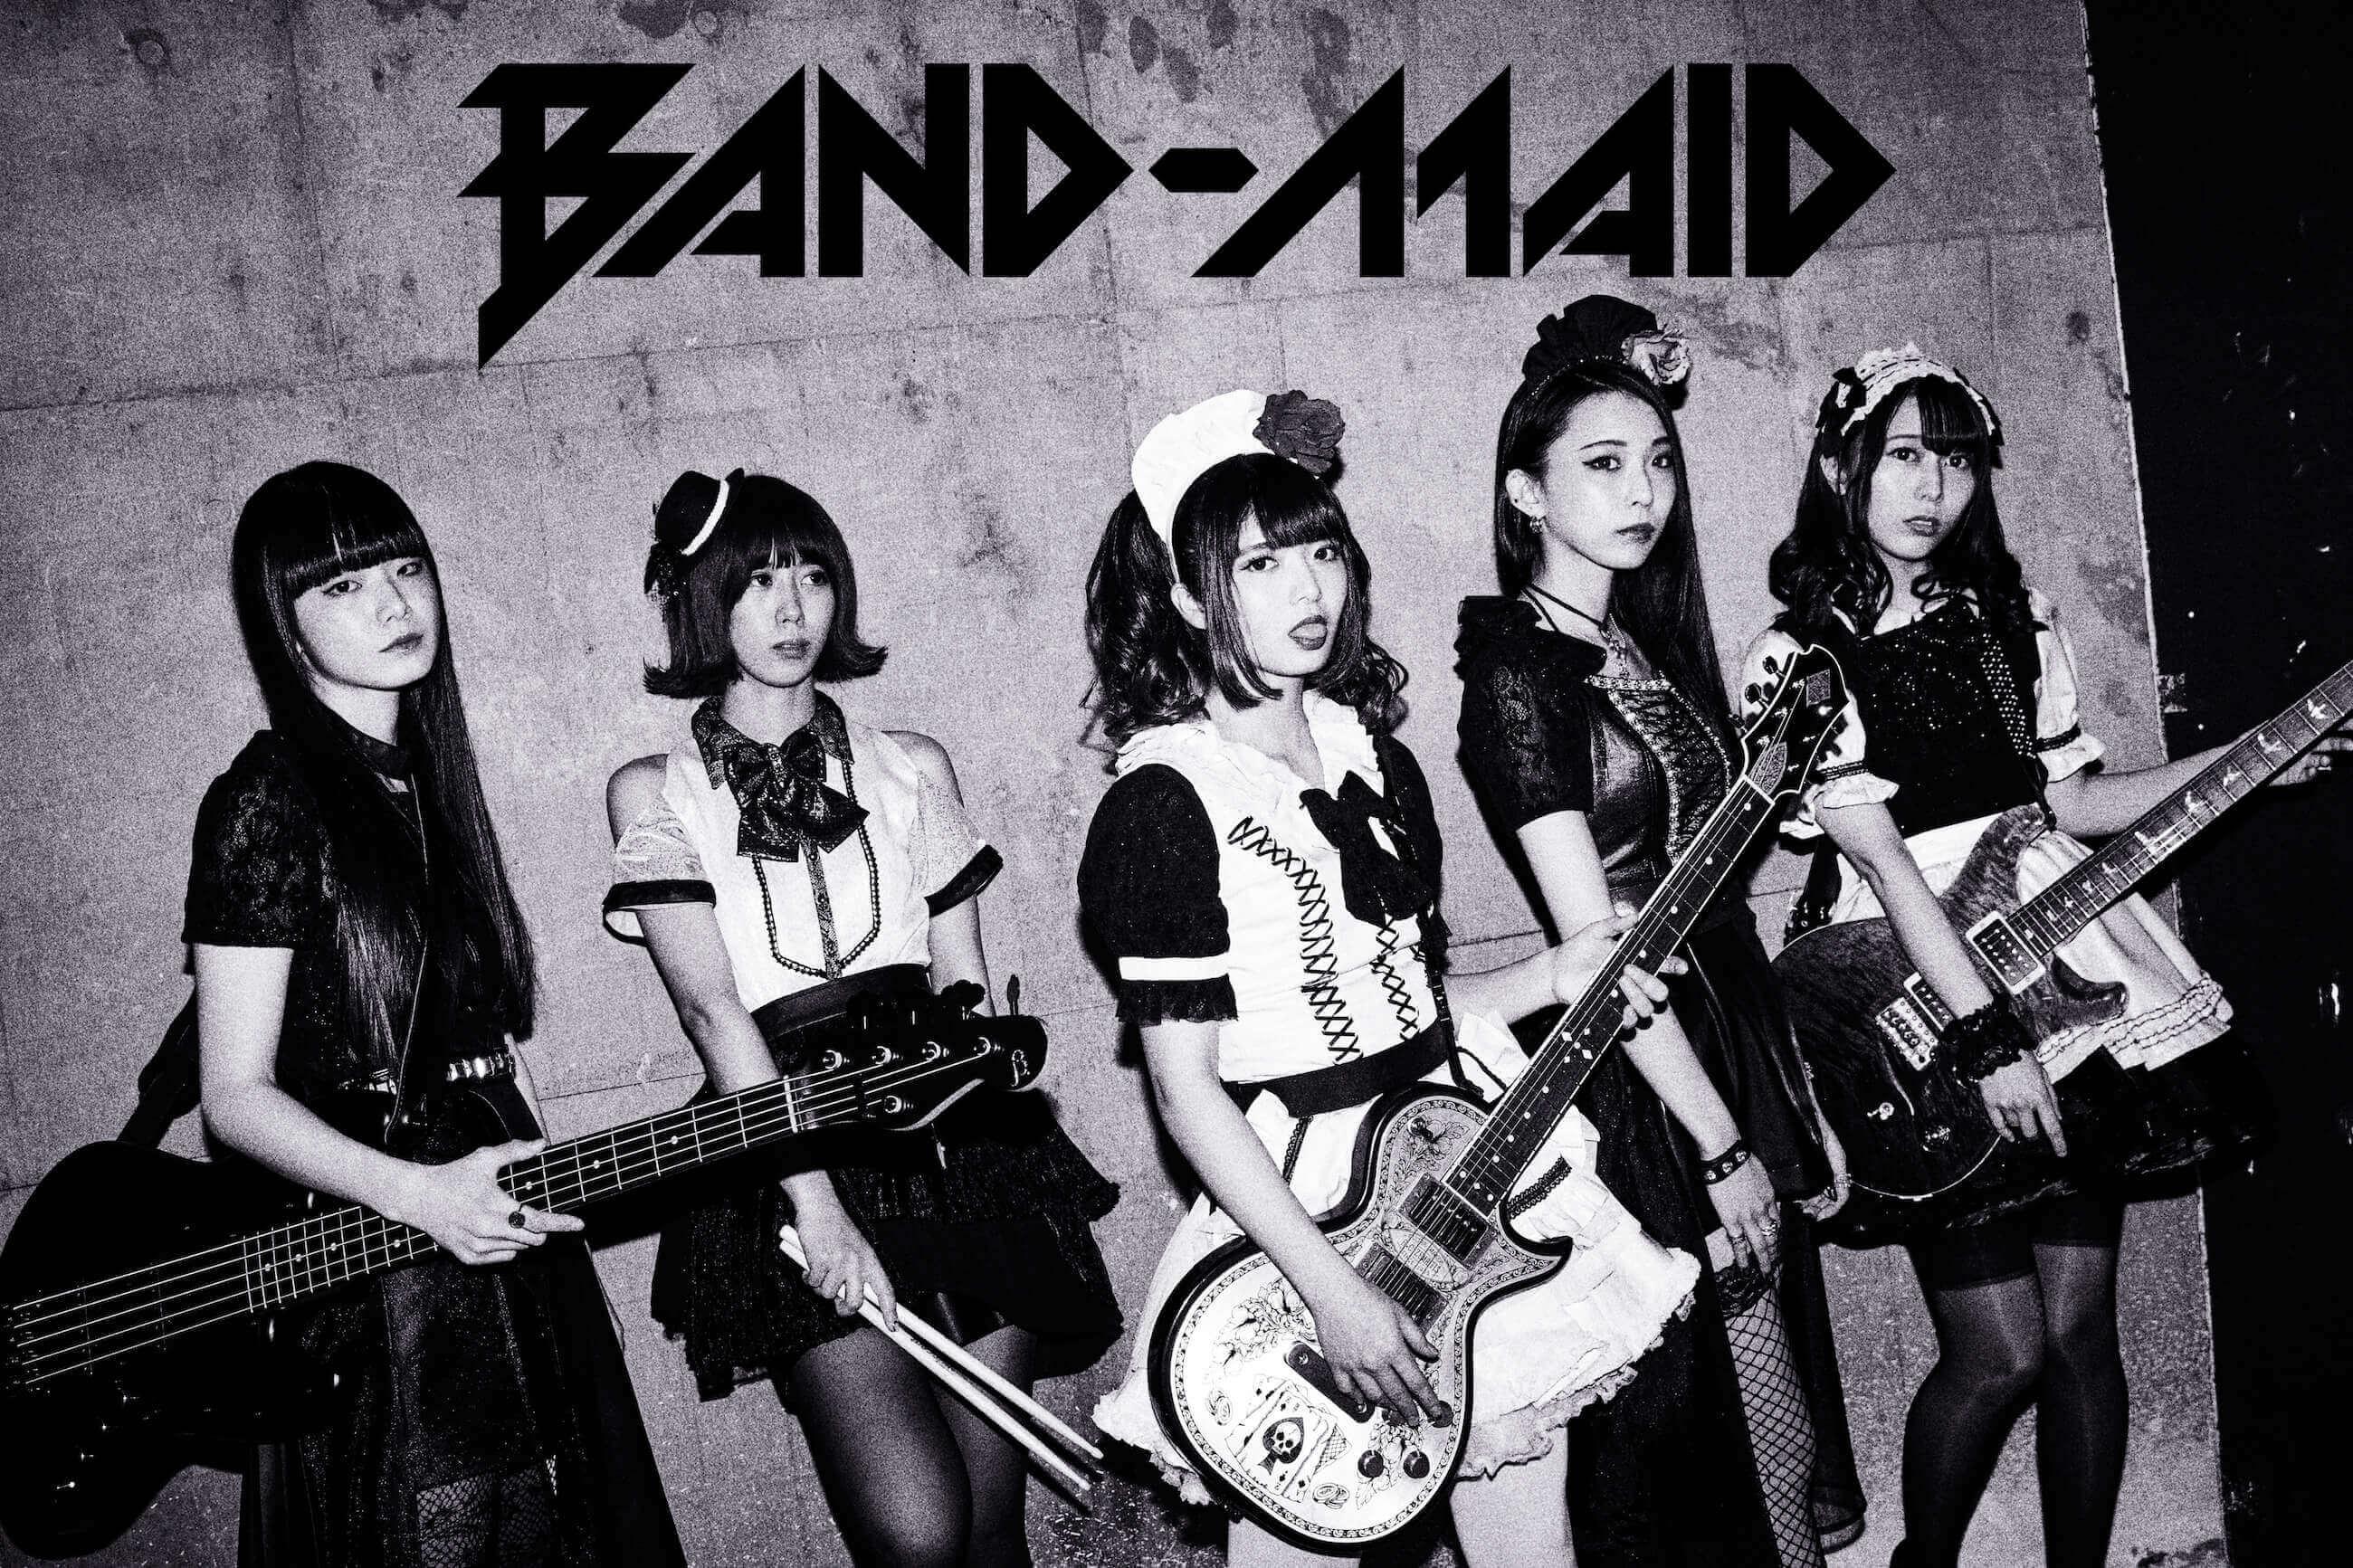 BAND-MAID 3rdシングル「start over」のアートワーク公開